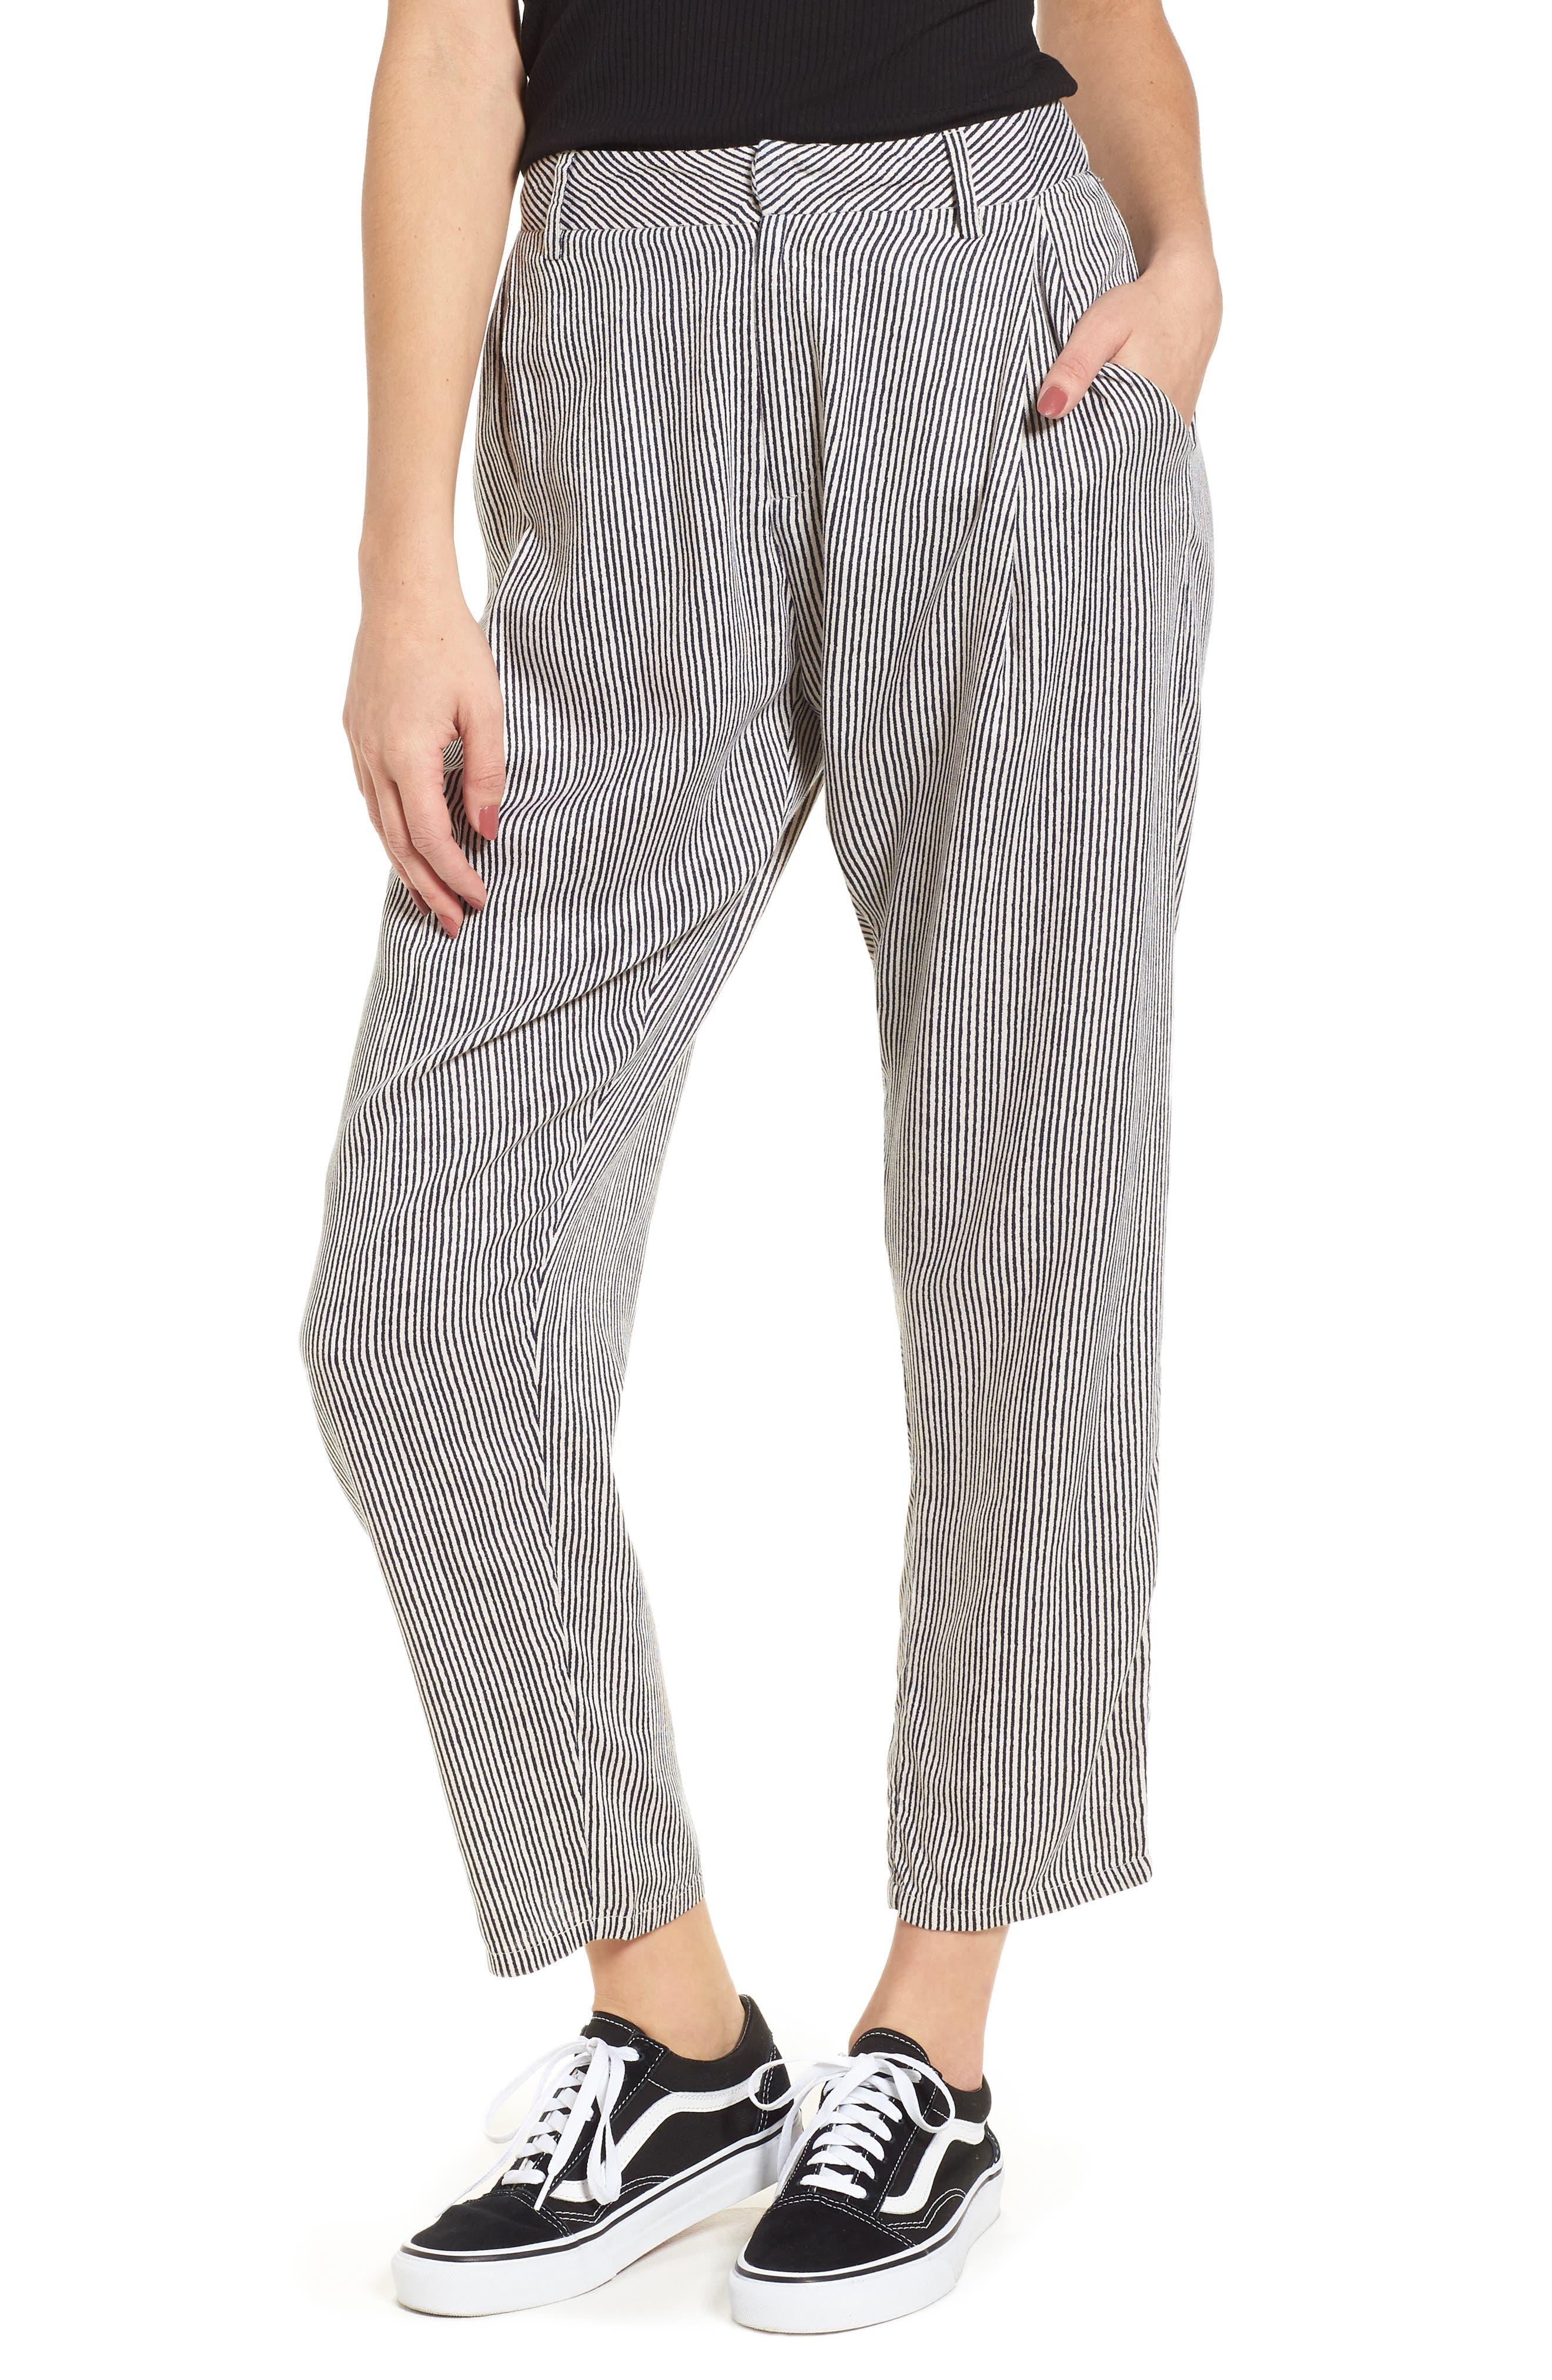 Chasing Sunshine Pants,                         Main,                         color, Ivory